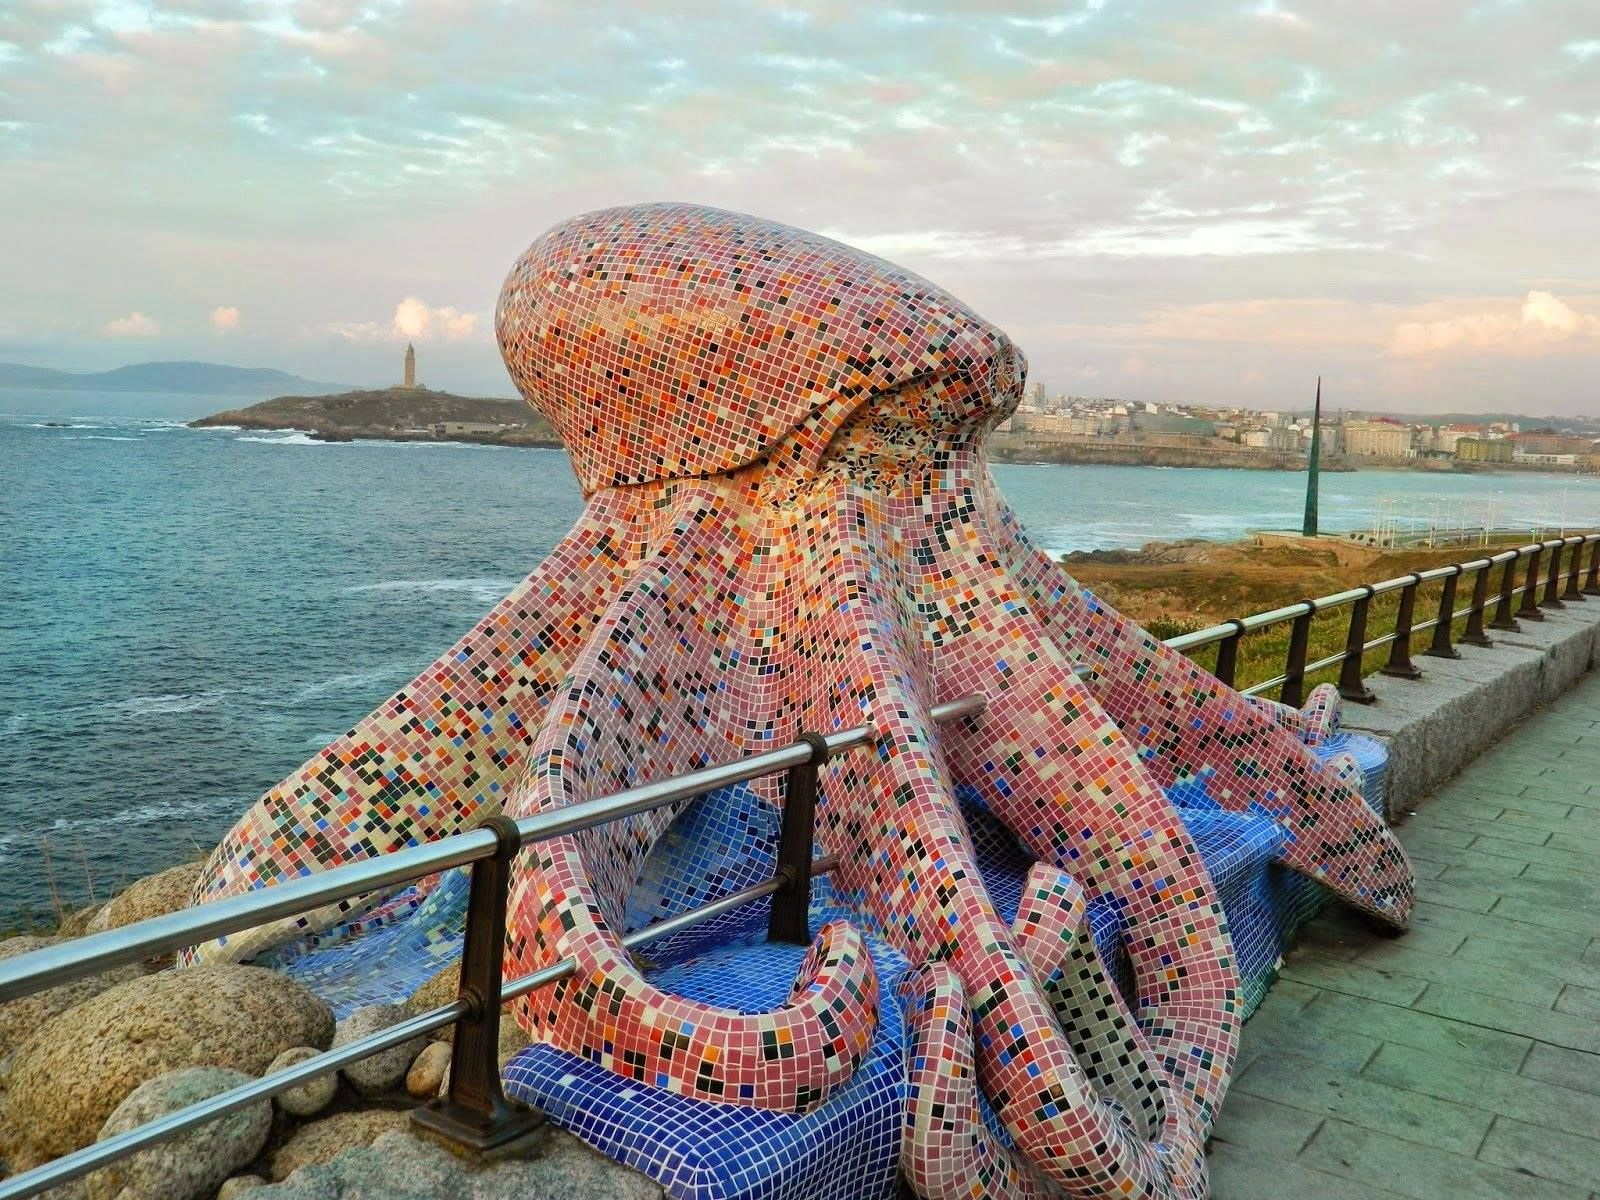 9851d0da98ccbb INVADING OCTOPUS Mosaic statue at A Coruña